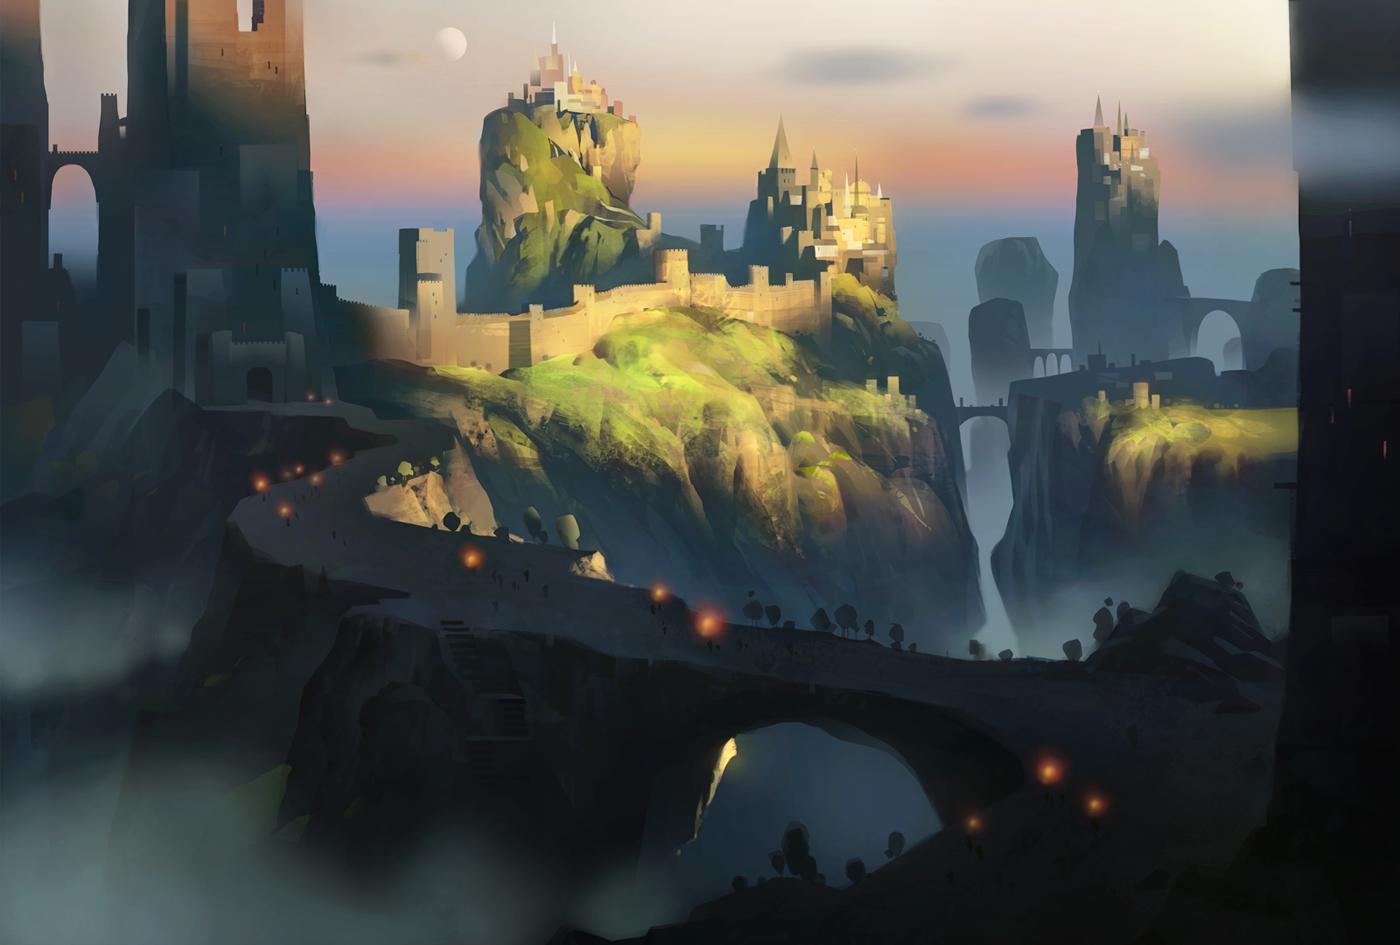 Fantasy by IvanLaliashvili